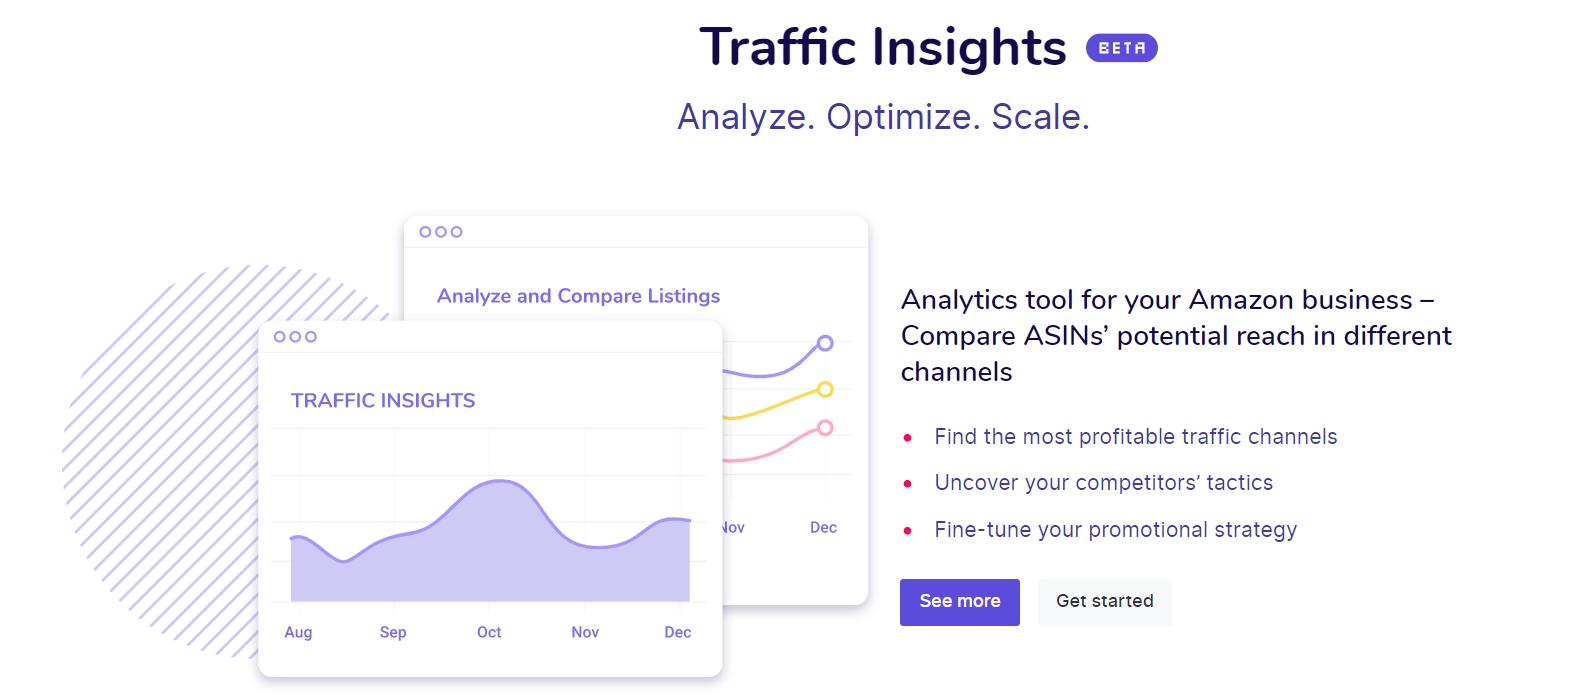 Traffic Insights